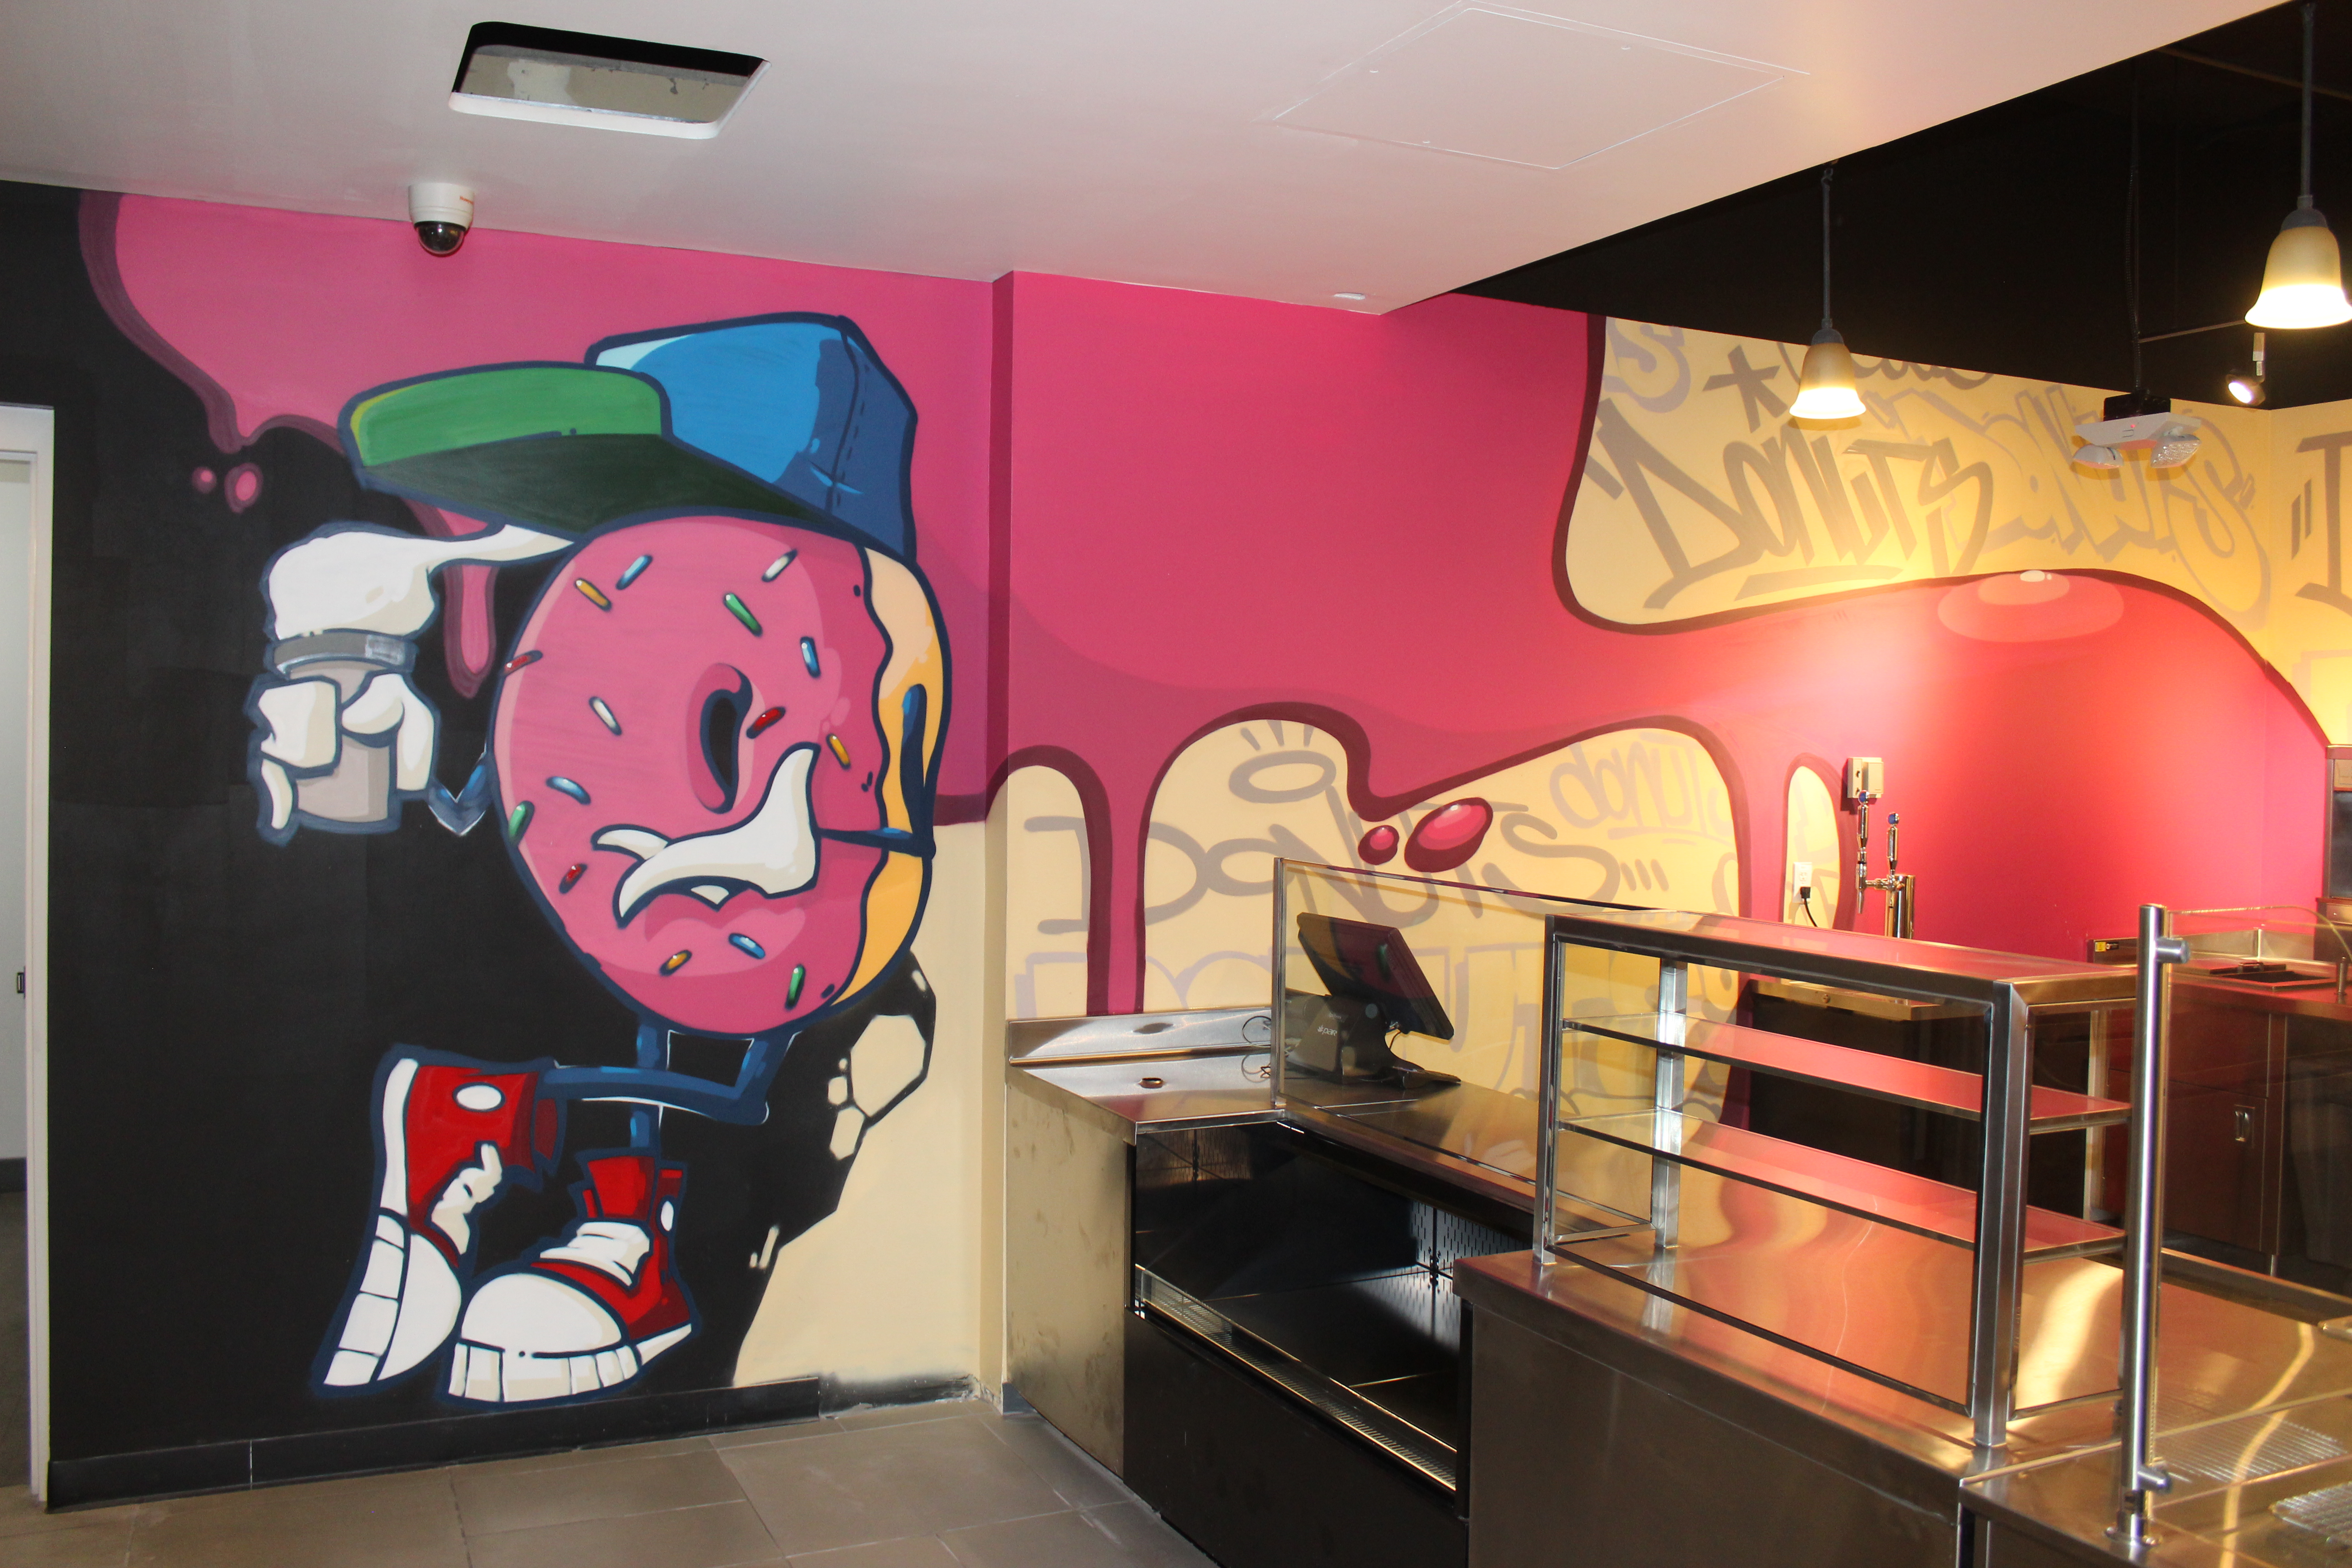 Linq Donut shop